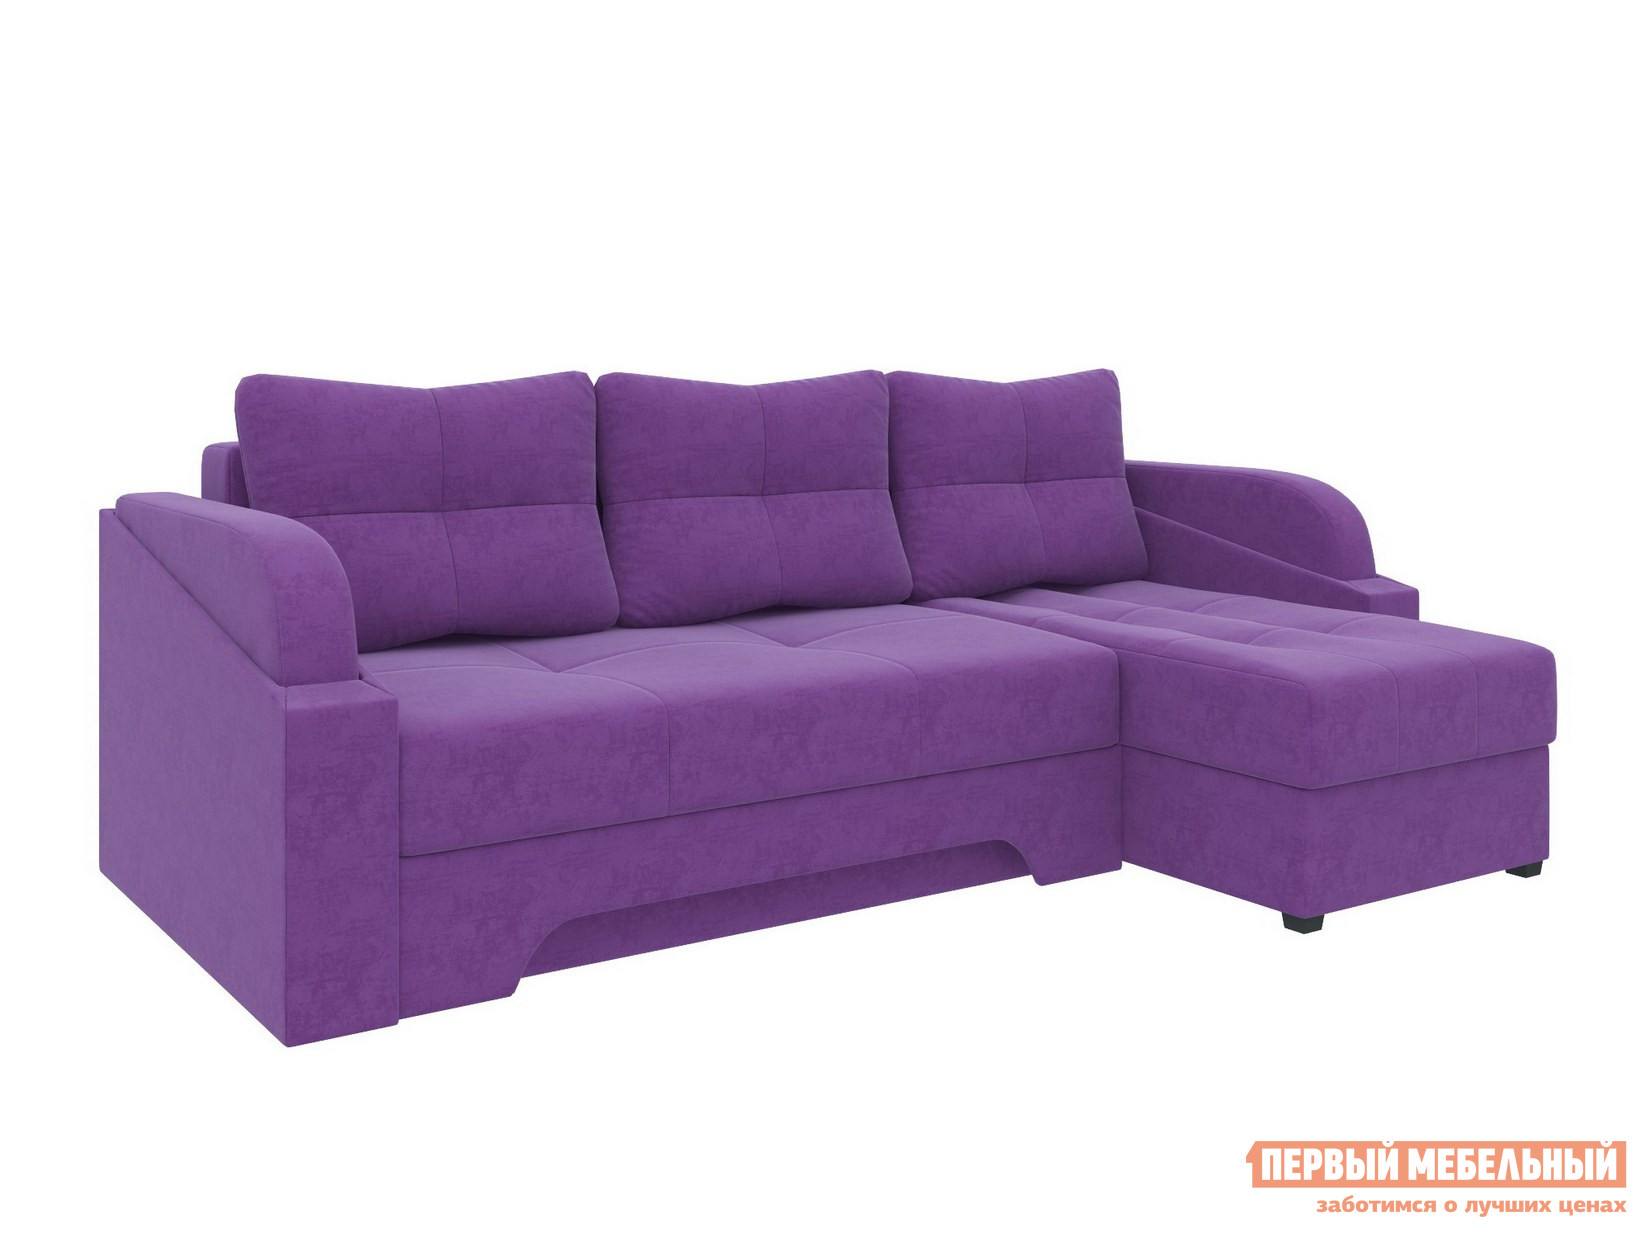 Угловой диван Мебелико Панда У ьсайт где можно диван б у новокузнецк